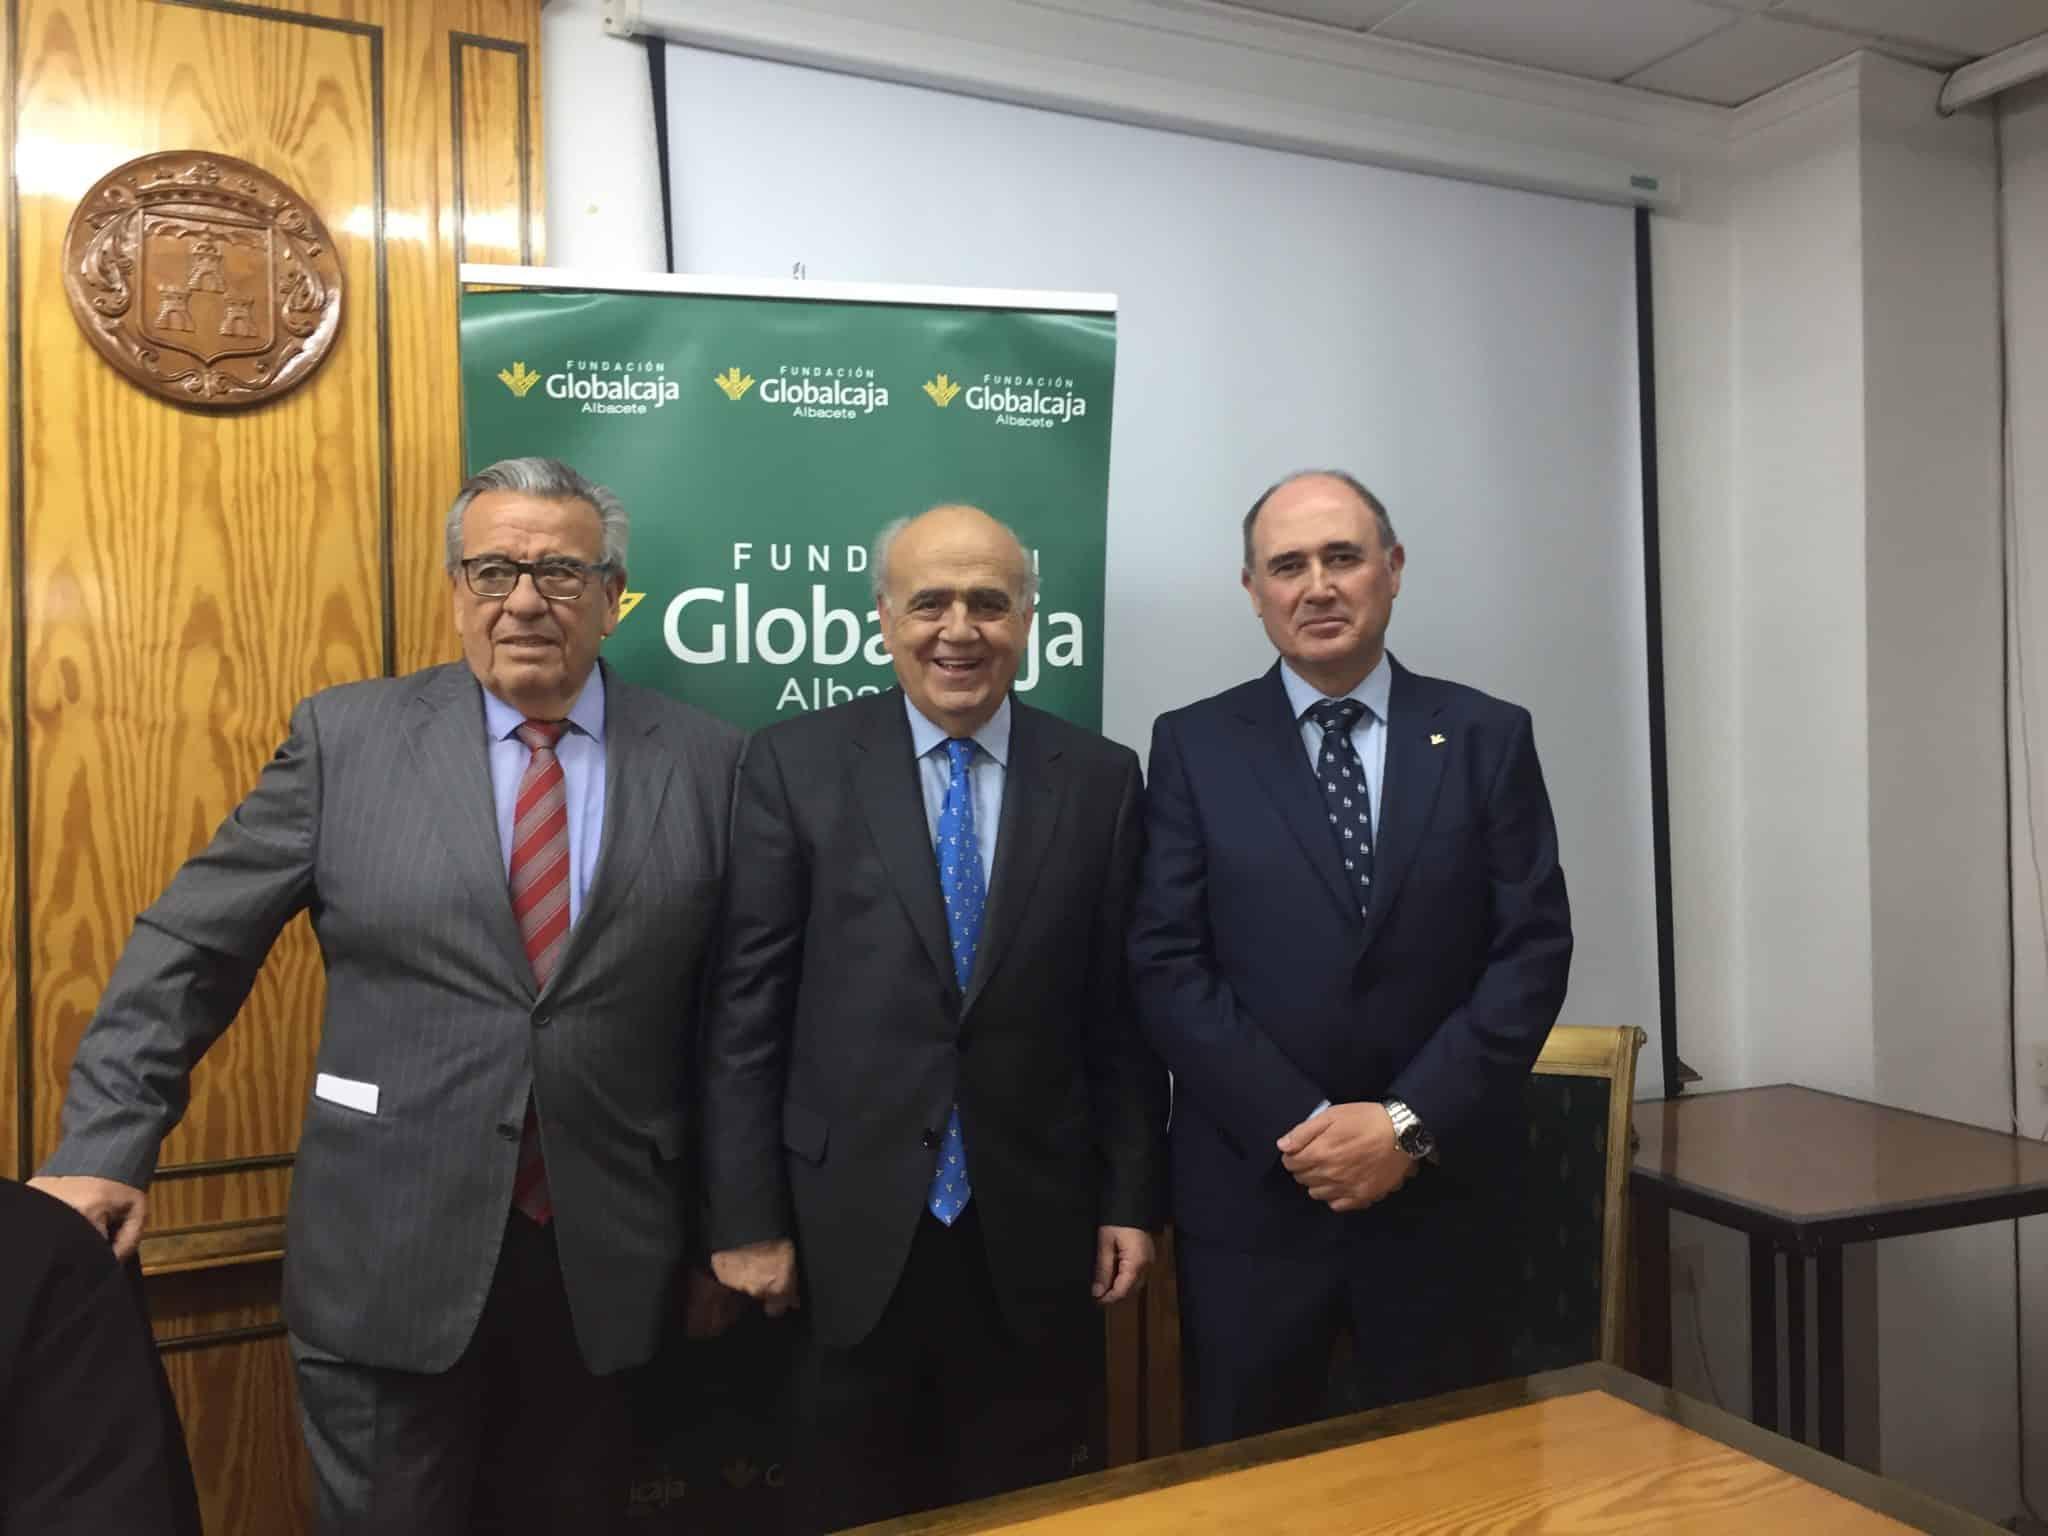 https://blog.globalcaja.es/wp-content/uploads/2018/04/IMG_6286.jpg